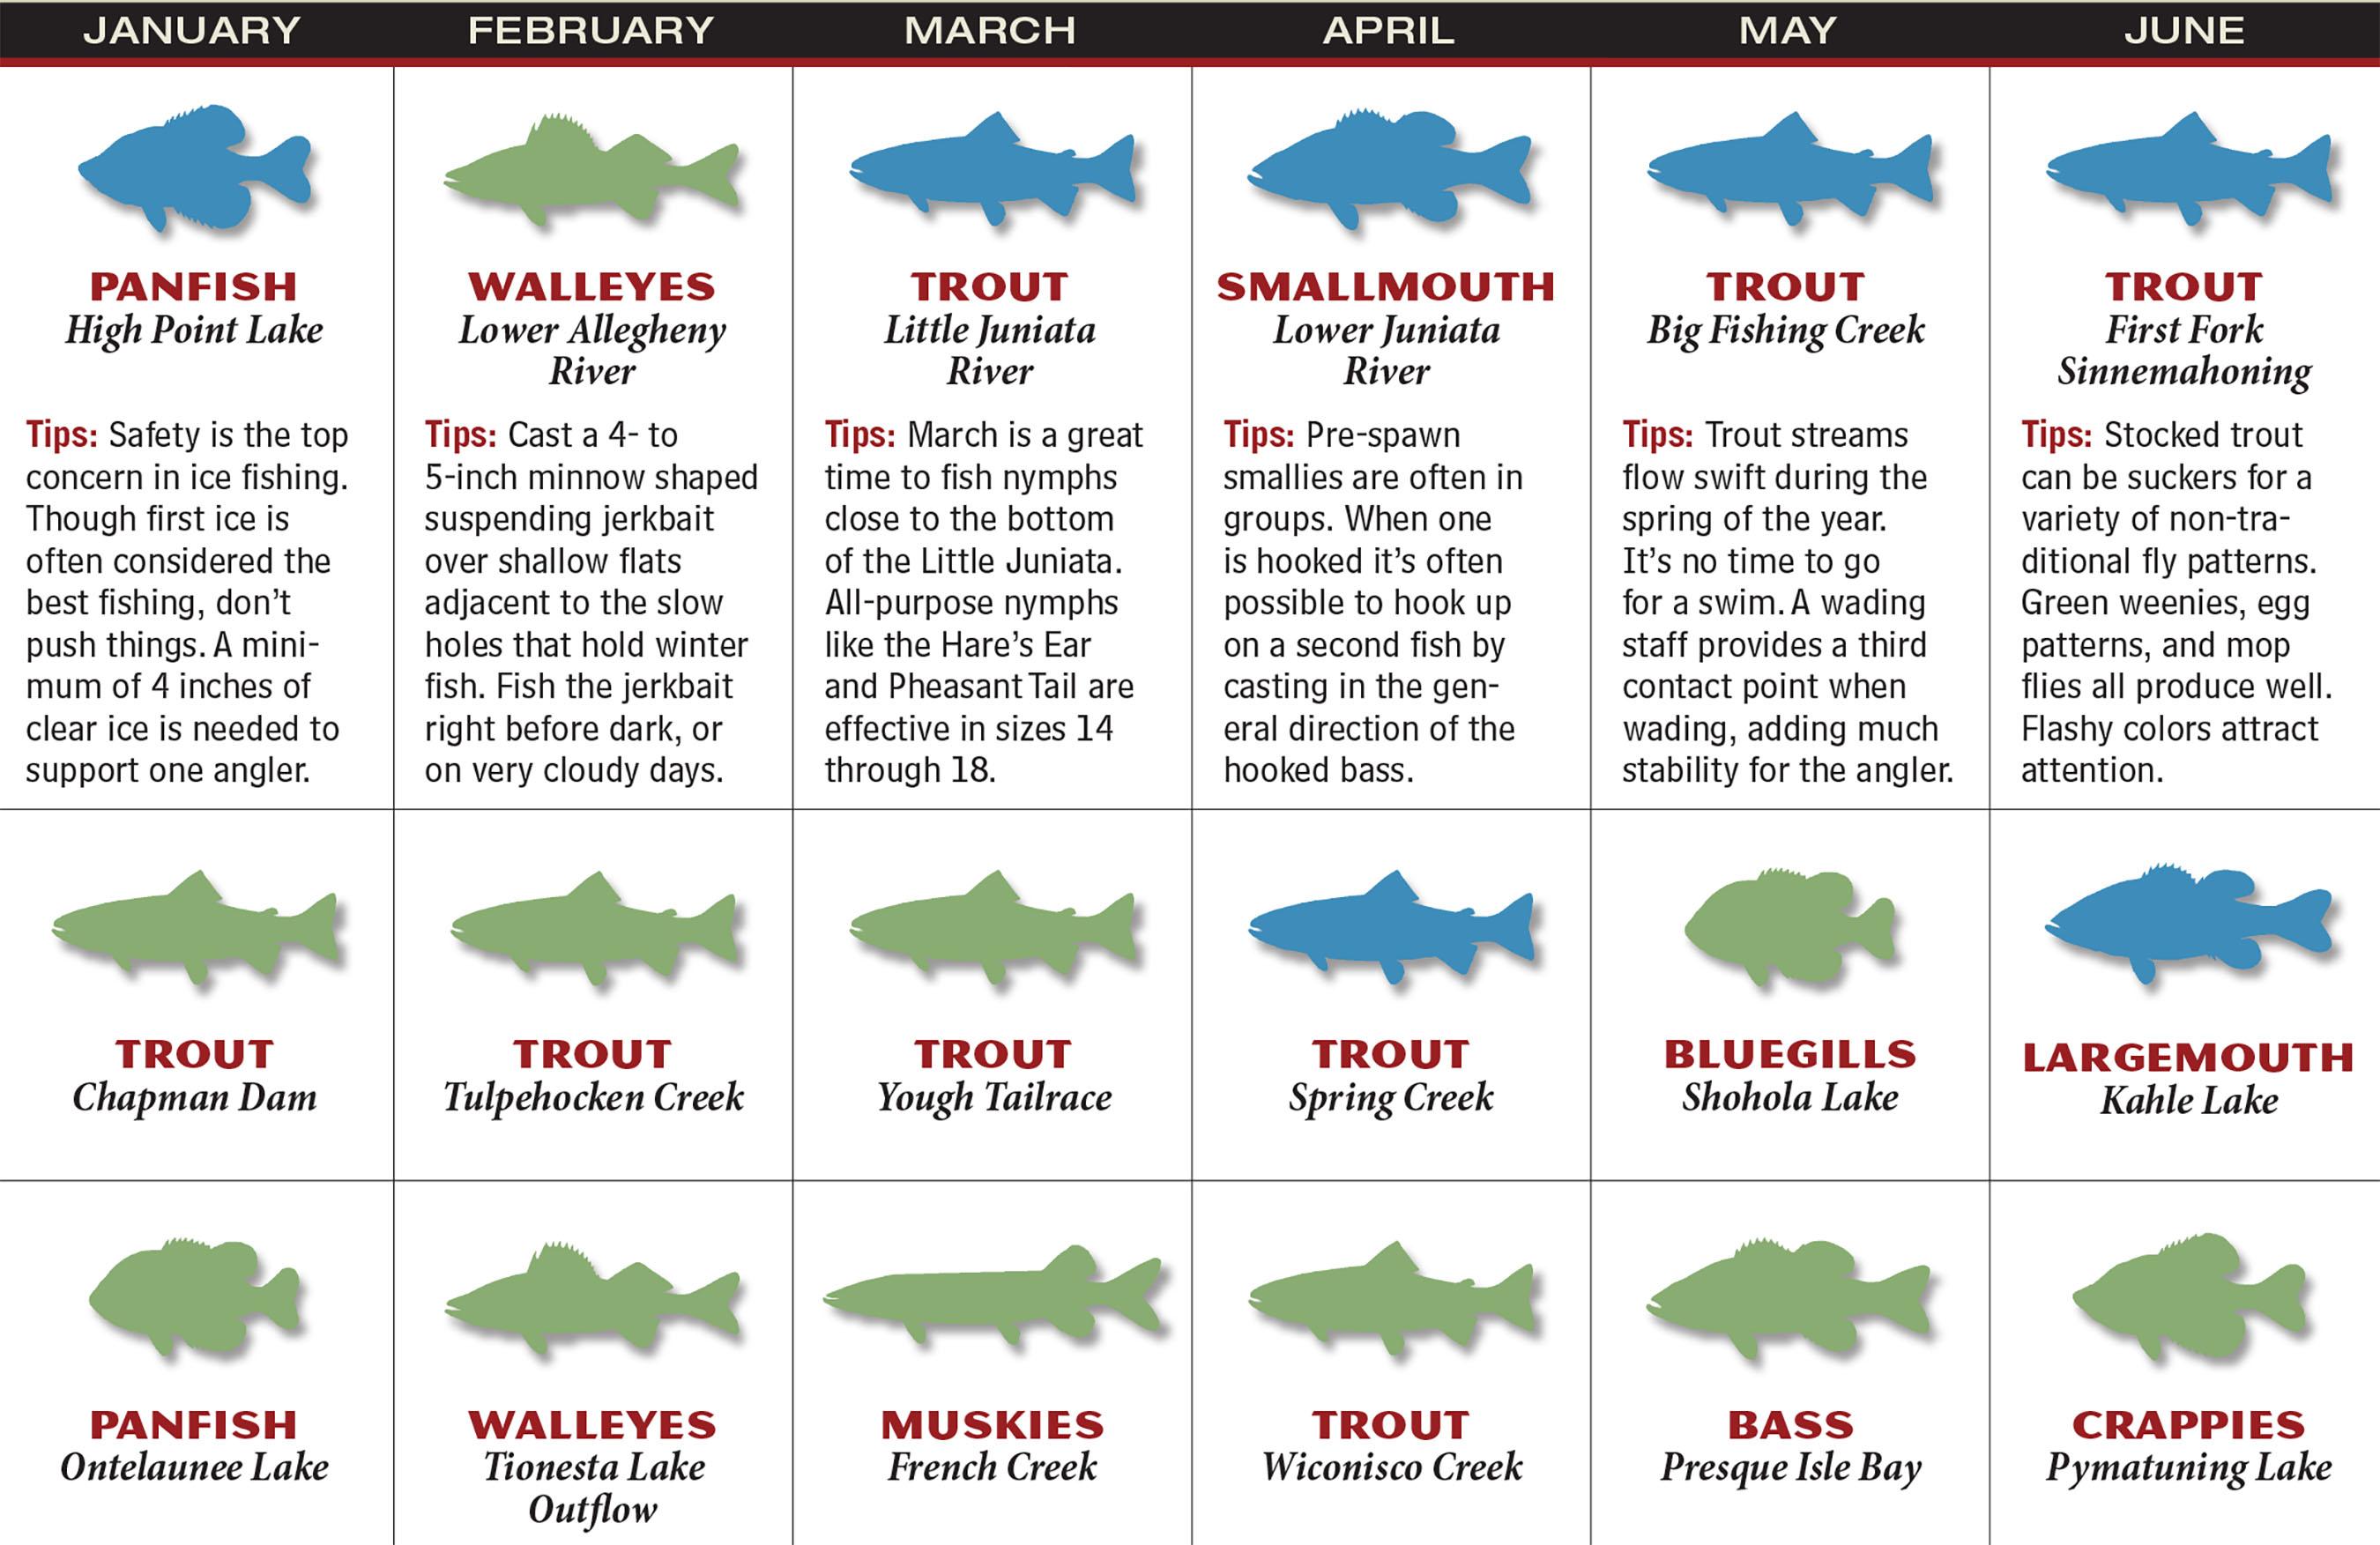 PA Fishing Forecast Calendar P1